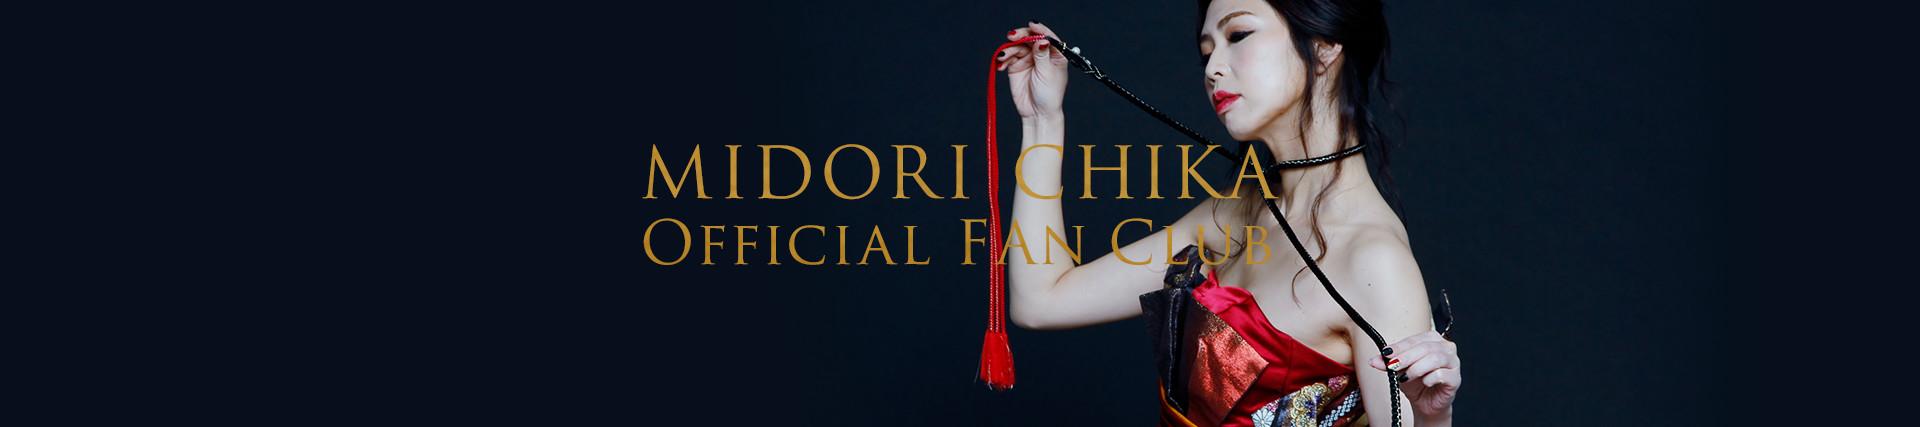 MIDORI CHIKA OFFICIAL FUN CLUB